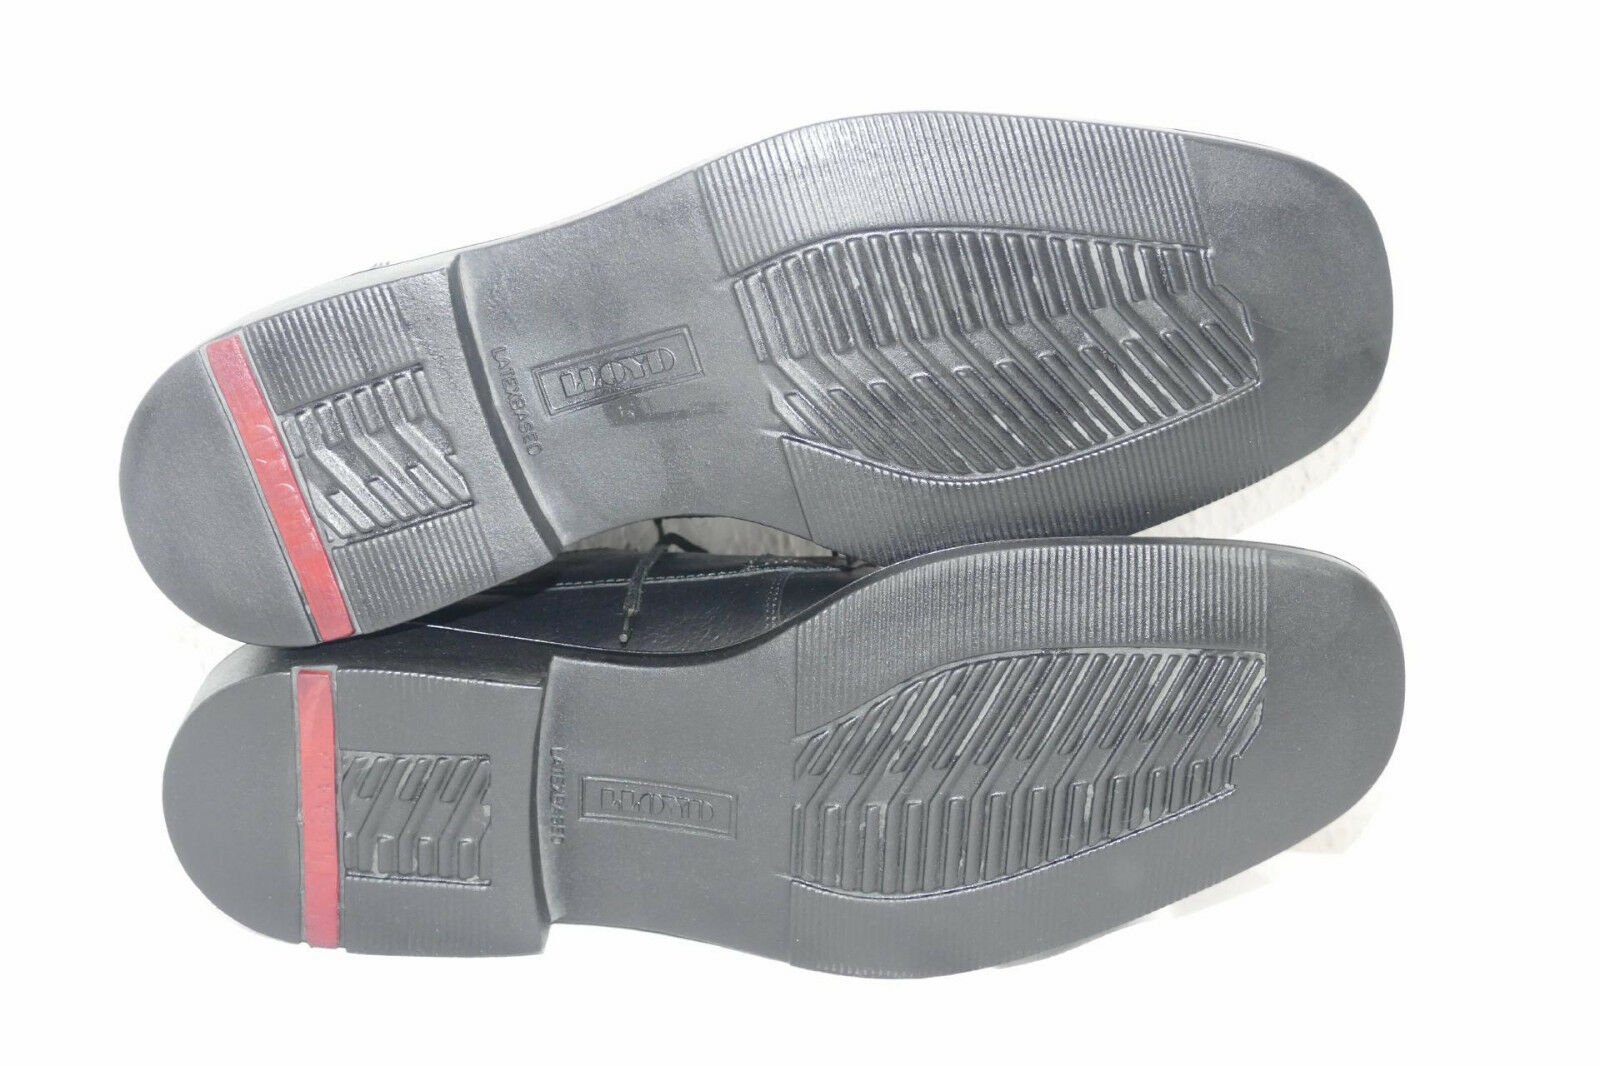 808---Lloyd  Modell Denzel UK 8,5  neuwertig schwarz  Lederschnürer leicht Farbe schwarz neuwertig c4f6c2